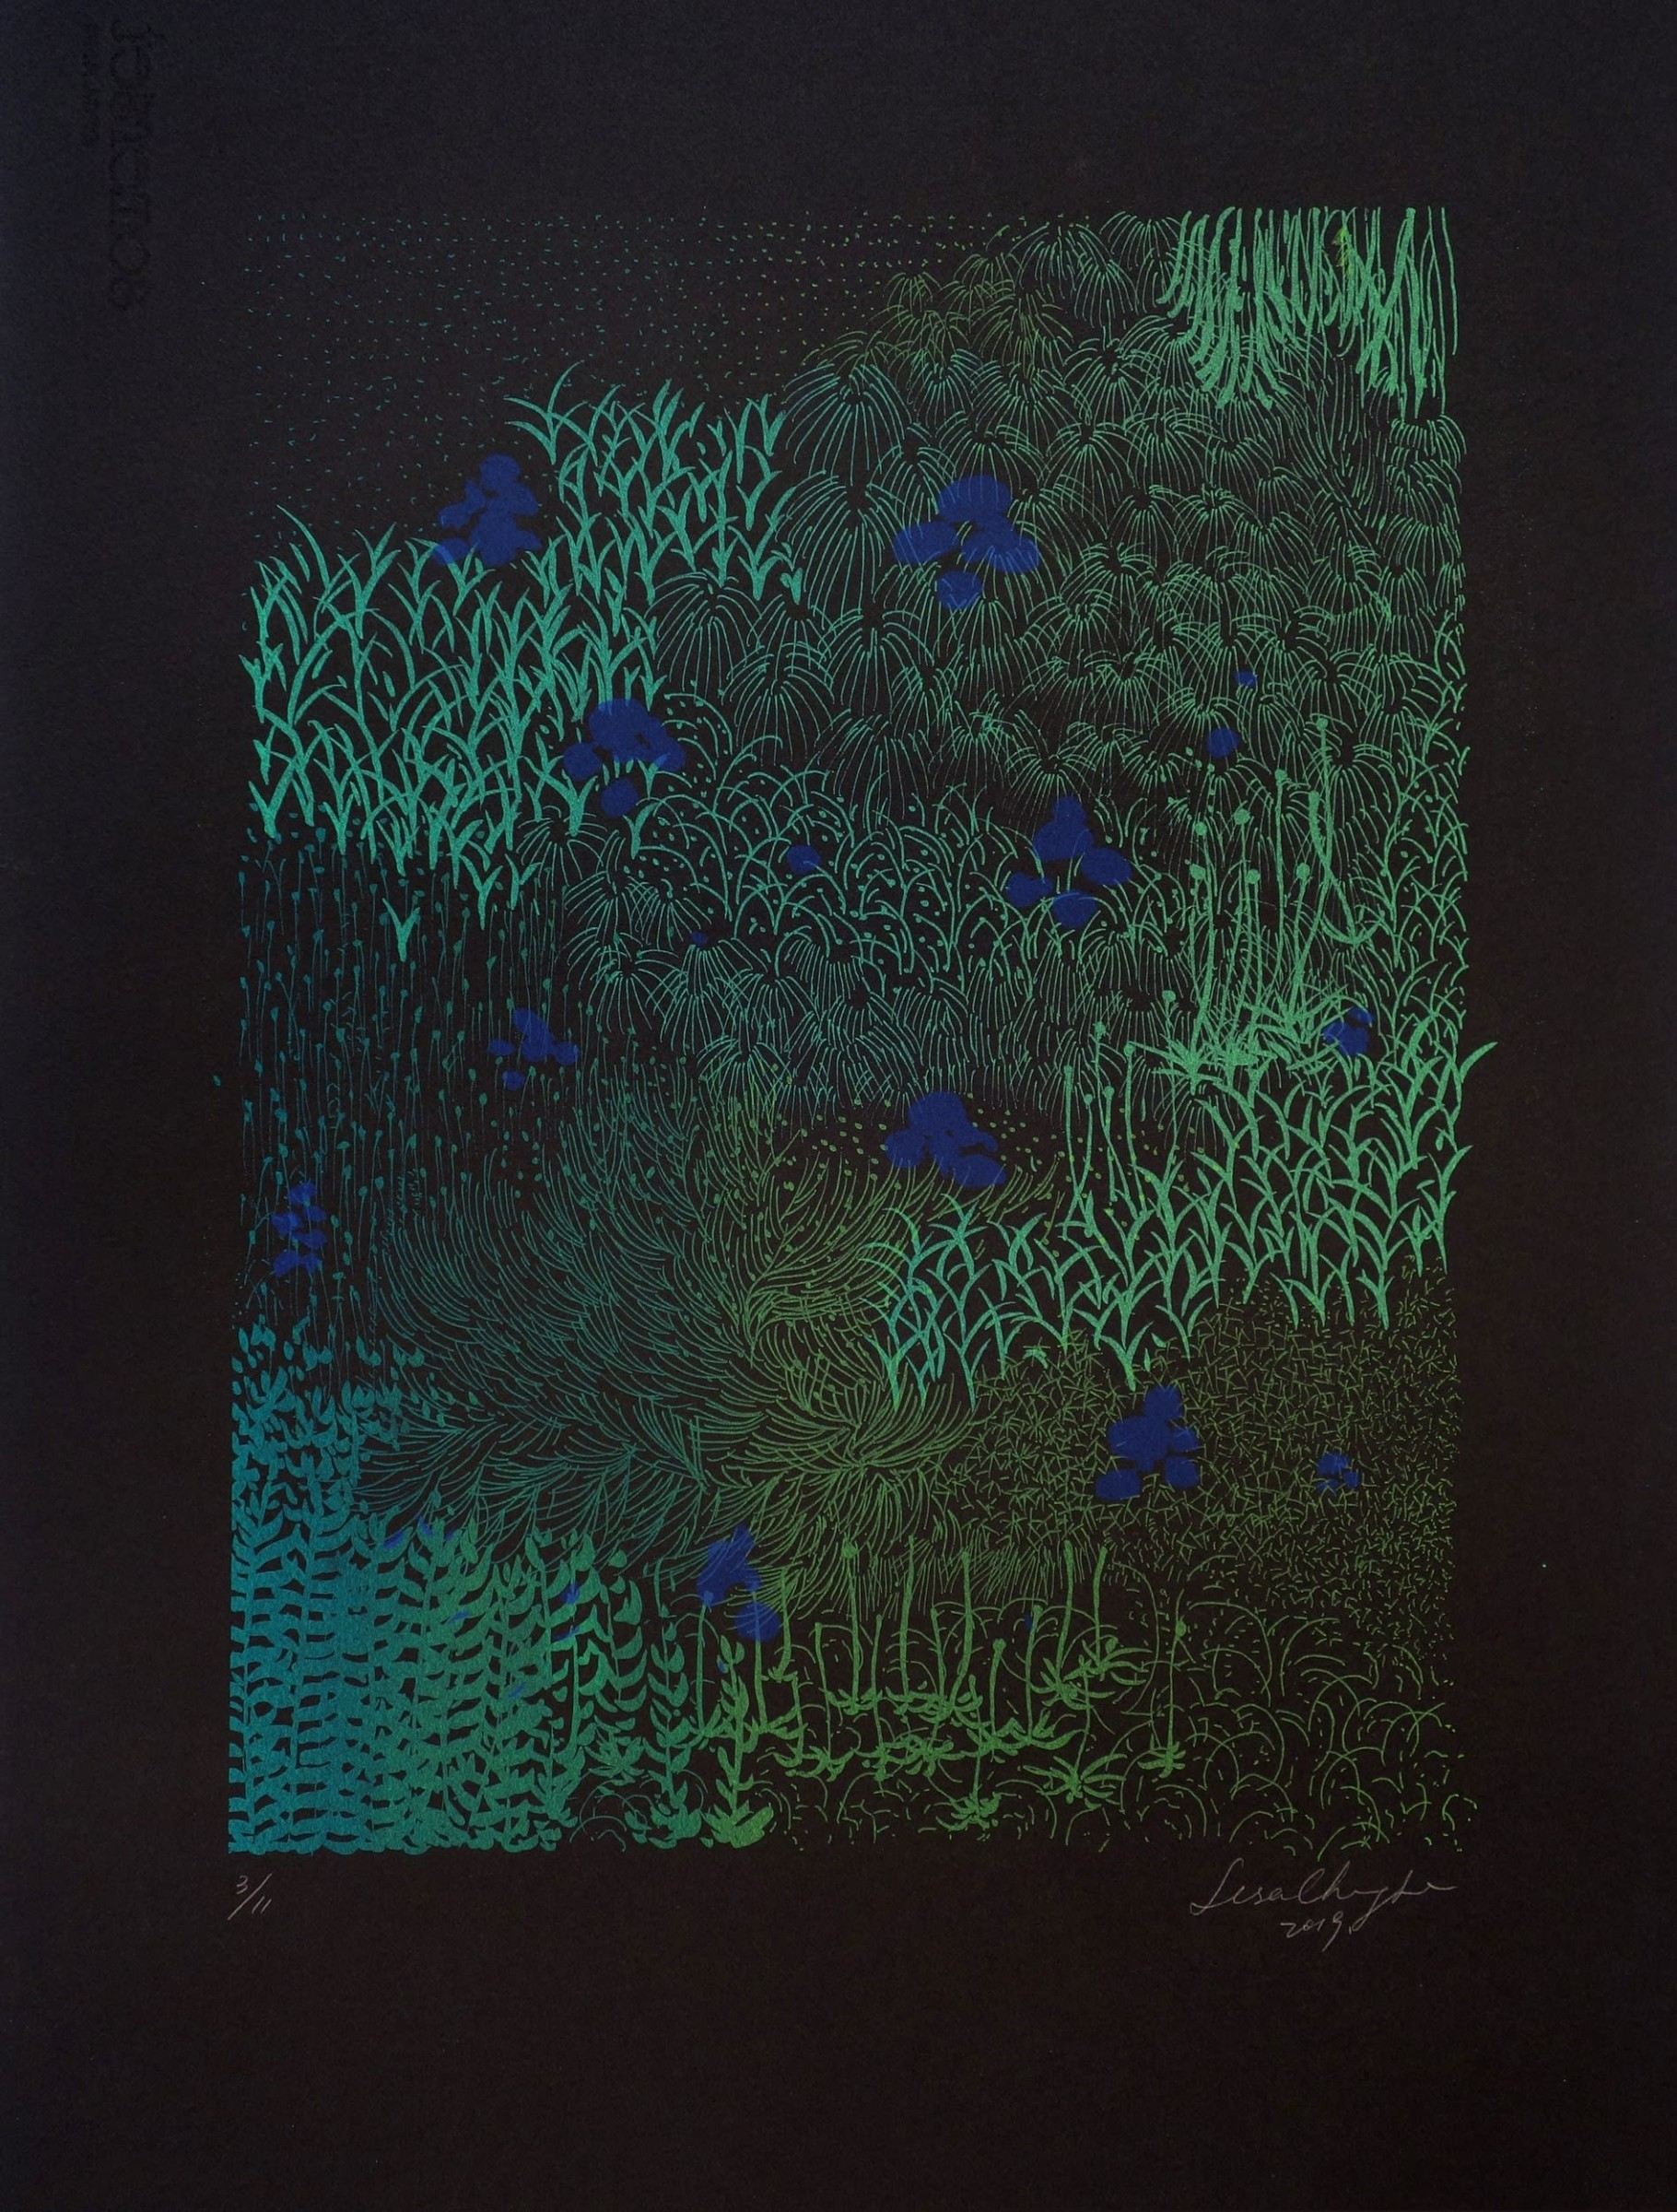 "<span class=""link fancybox-details-link""><a href=""/artists/225-lisa-chang-lee-are/works/10704/"">View Detail Page</a></span><div class=""artist""><span class=""artist""><strong>Lisa Chang Lee ARE</strong></span></div><div class=""title""><em>Swedish Garden (Night)</em></div><div class=""medium"">silk screen on somerset paper black velvet</div><div class=""dimensions"">36.5 x 27 cm image size</div><div class=""edition_details"">3/11</div><div class=""price"">£369.00 unframed</div>"